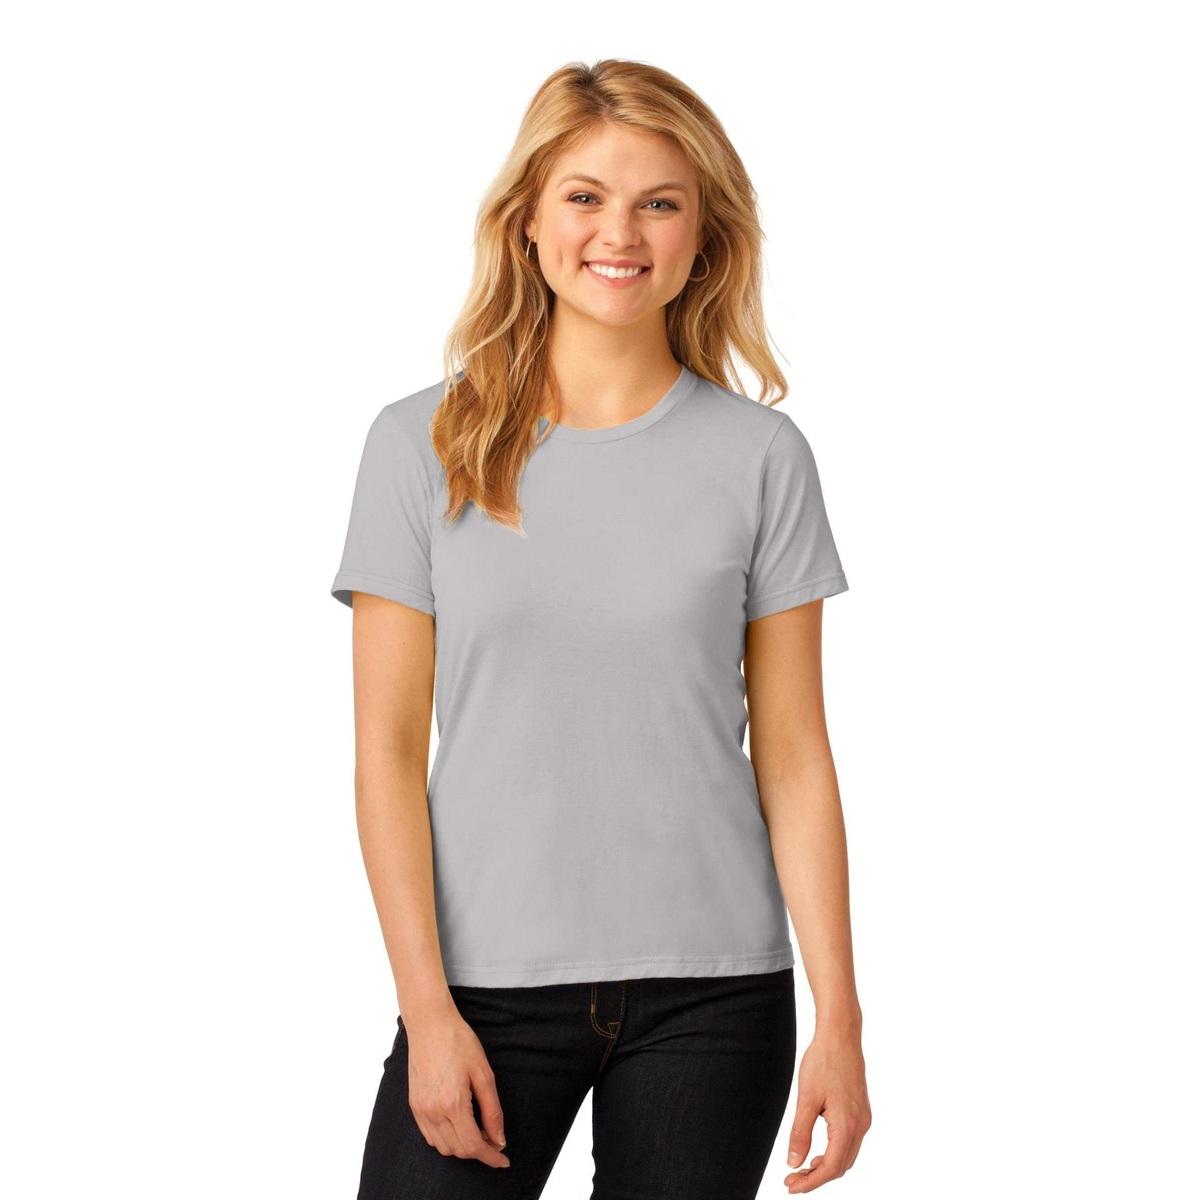 Anvil 880 ladies 100 ring spun cotton t shirt silver for 100 ringspun cotton t shirt wholesale